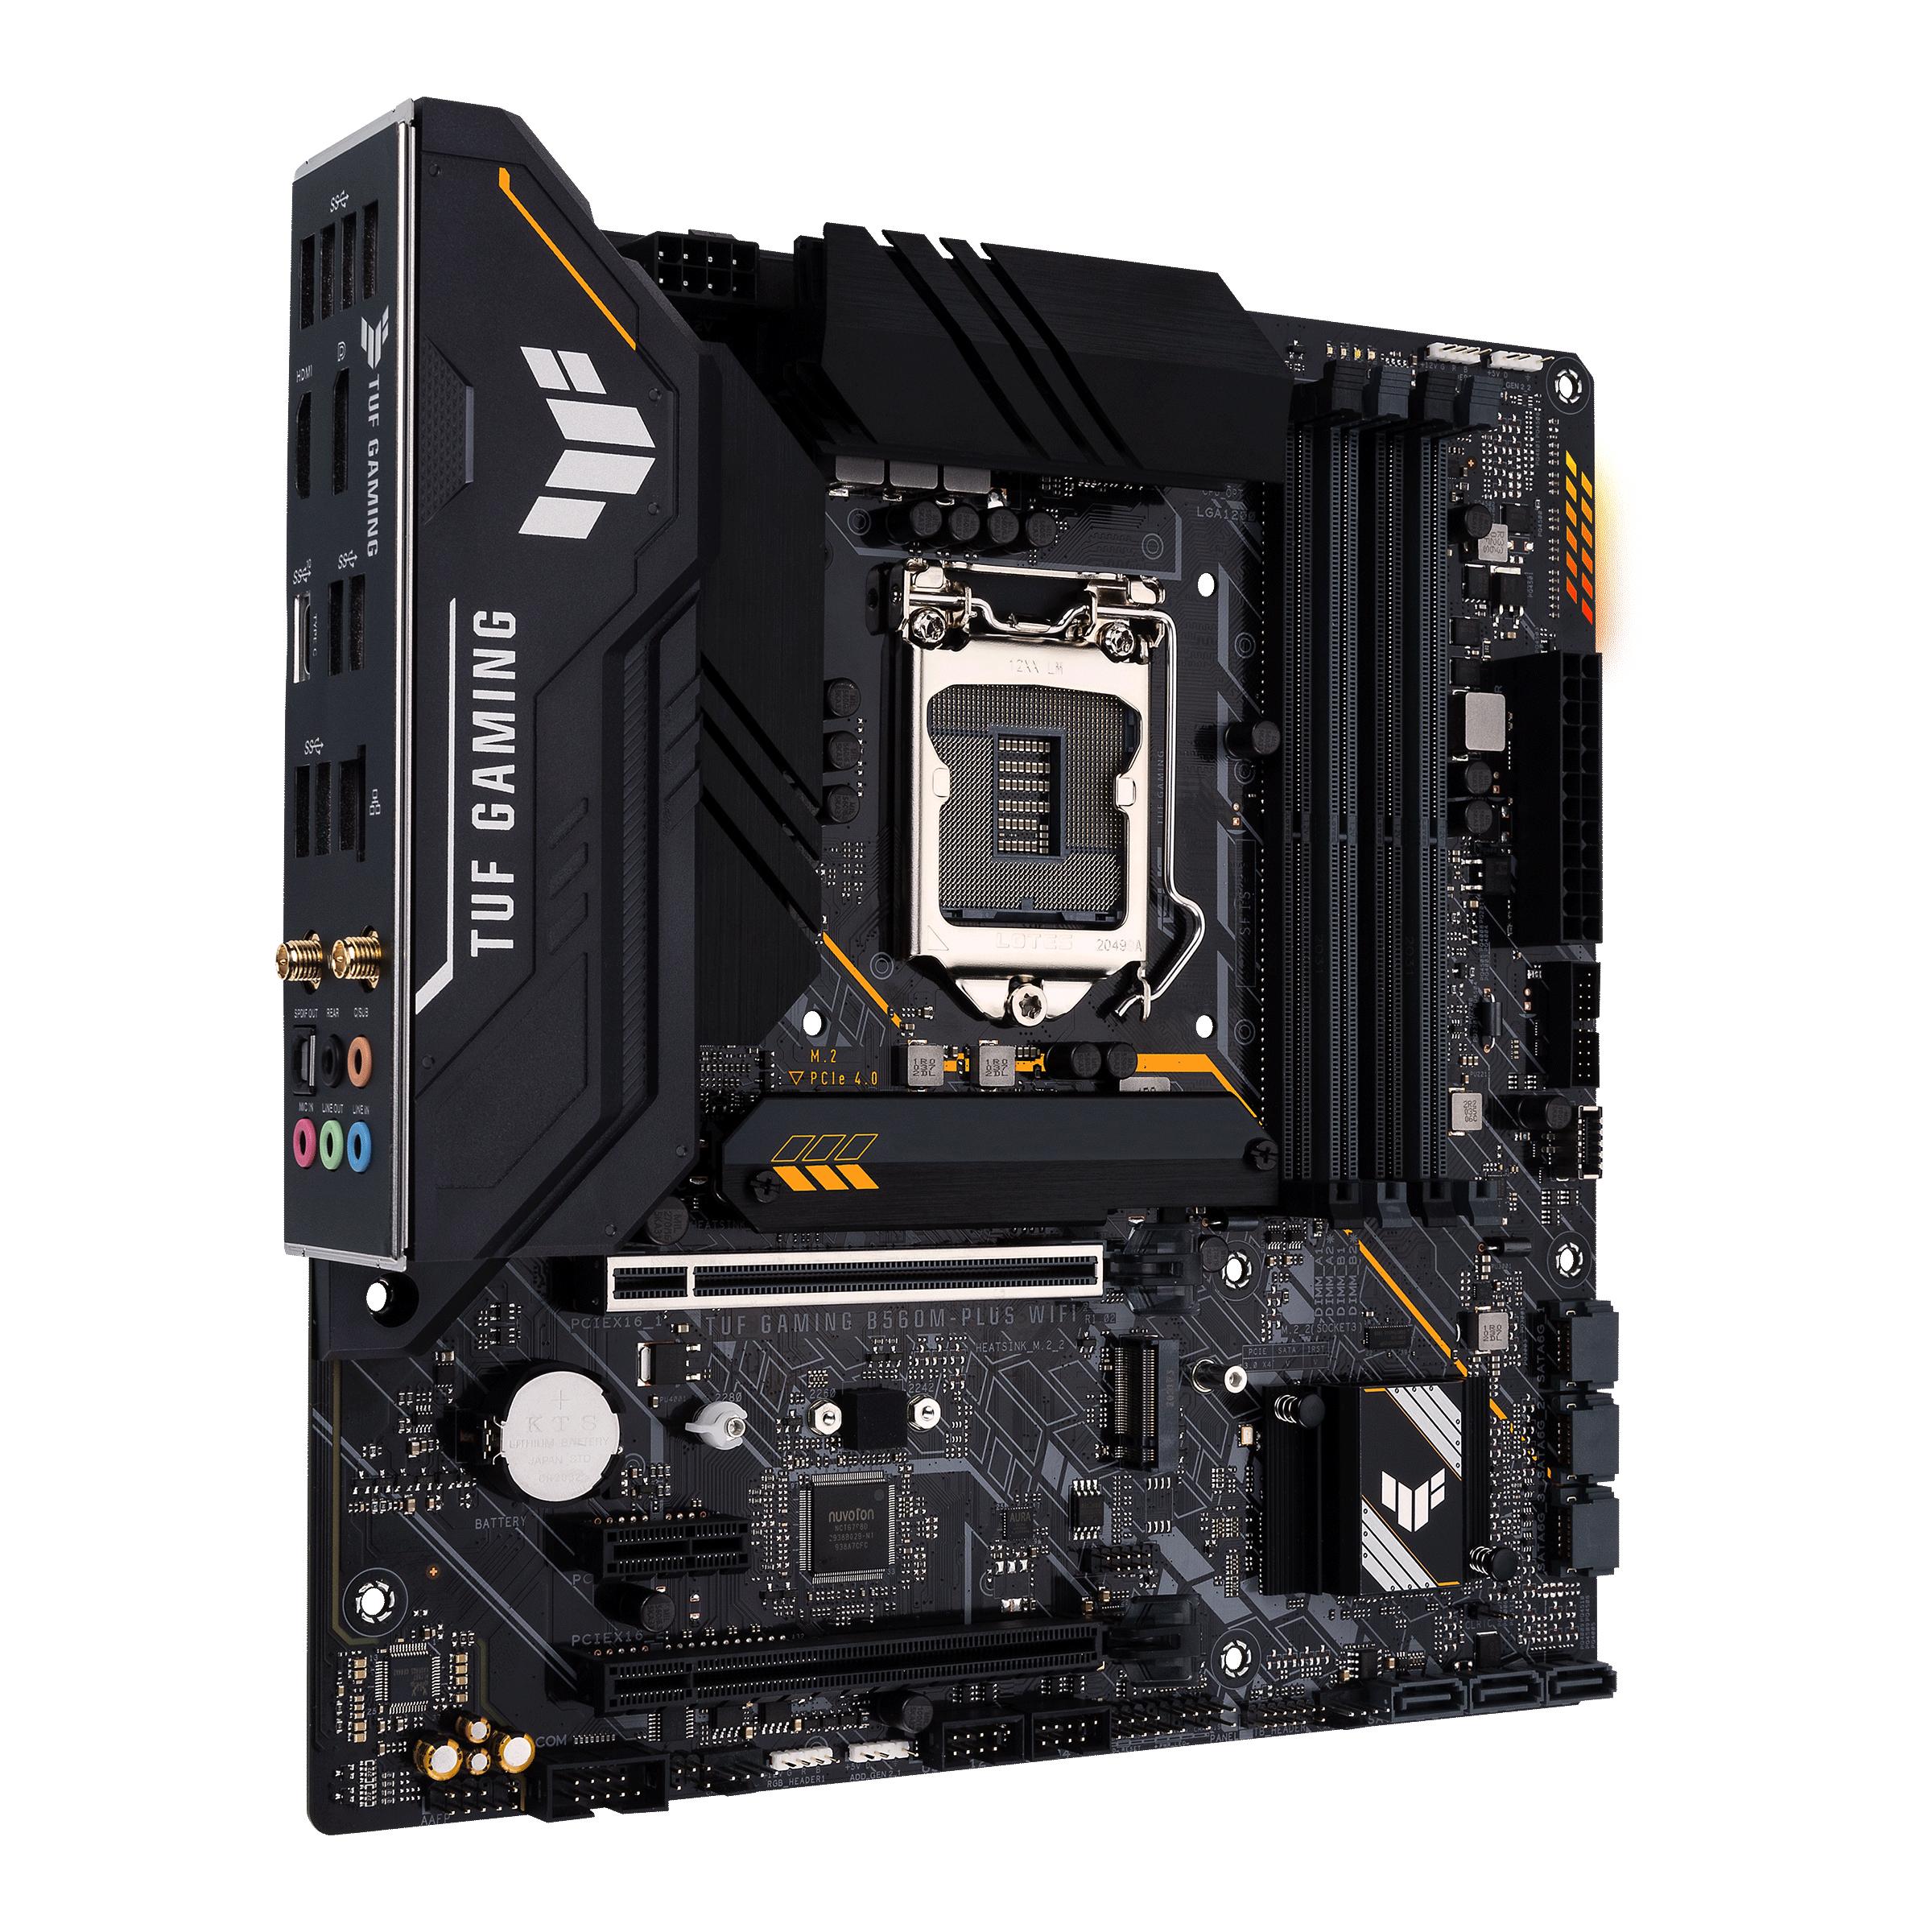 ASUS TUF GAMING B560M-PLUS WIFI - Motherboard - micro ATX - LGA1200-Sockel - B560 - USB-C Gen1, USB 3.2 Gen 1, USB 3.2 Gen 2 - 2.5 Gigabit LAN, Wi-Fi, Bluetooth - Onboard-Grafik (CPU erforderlich)